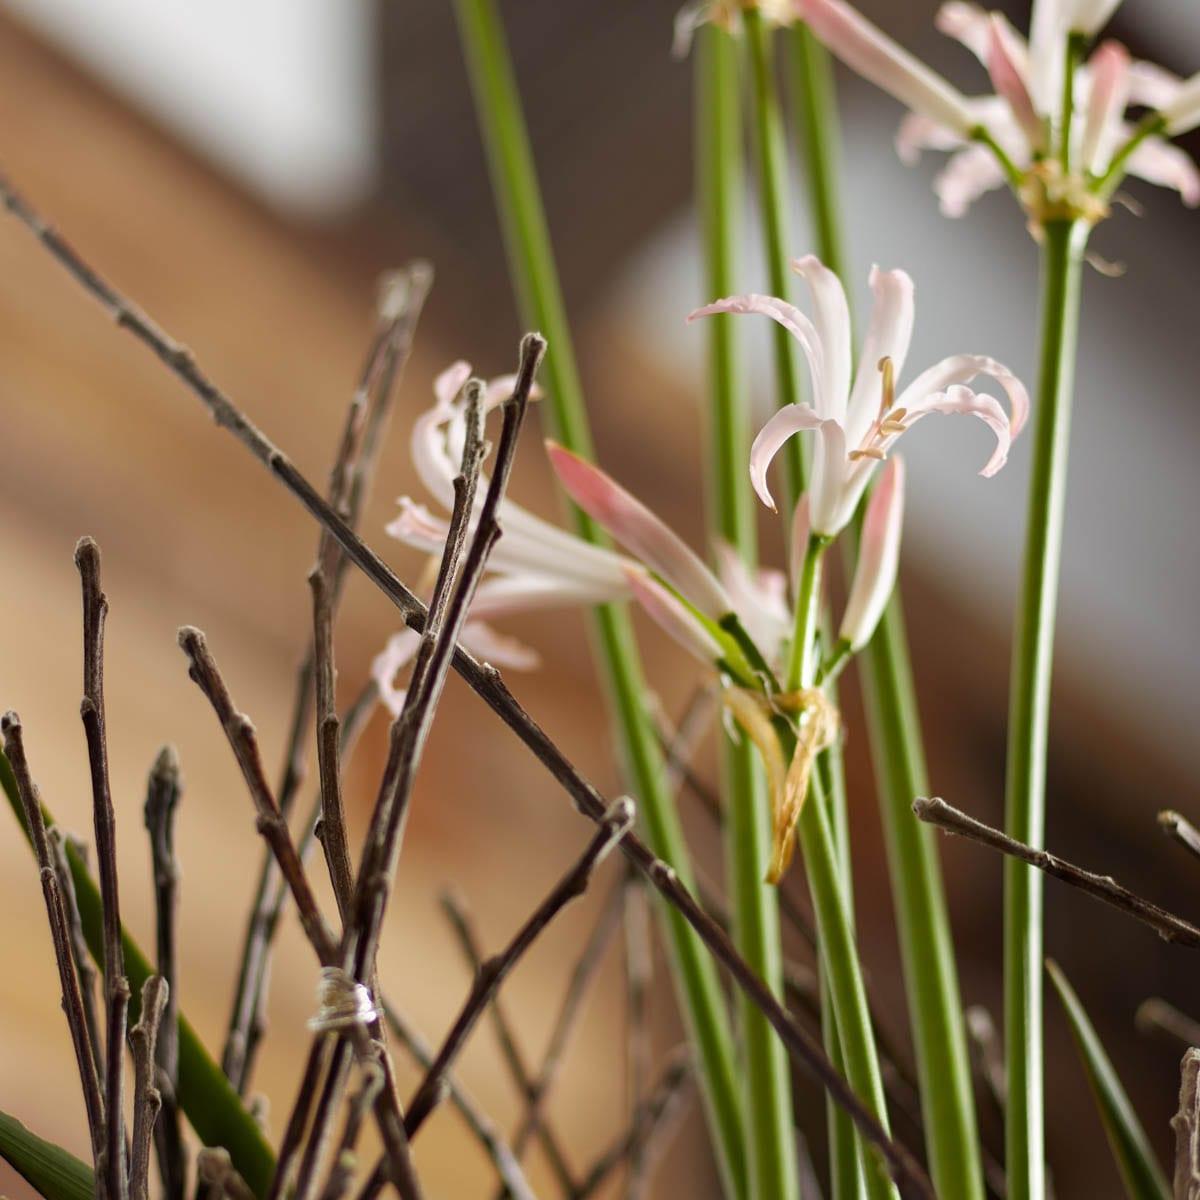 Floral Designs by Radko Chapov